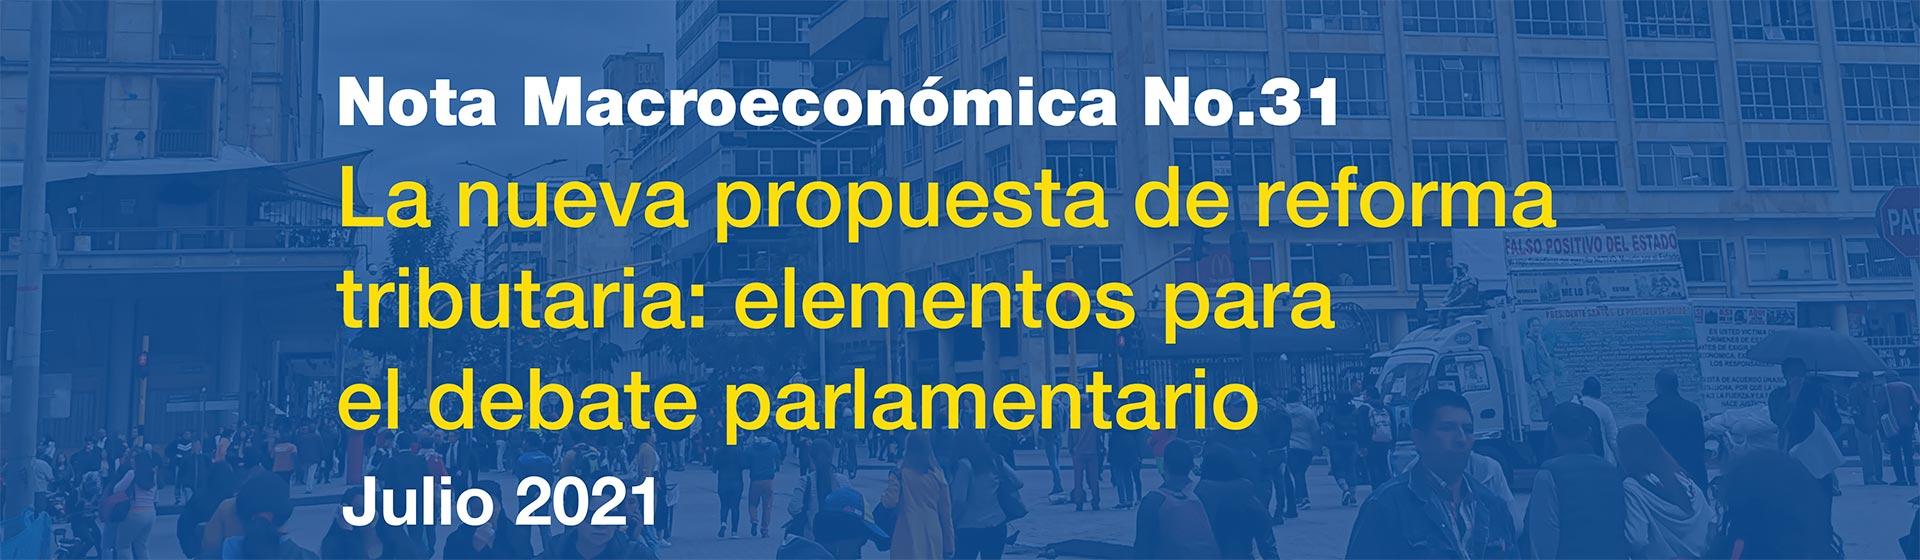 Nota Macroeconómica 31